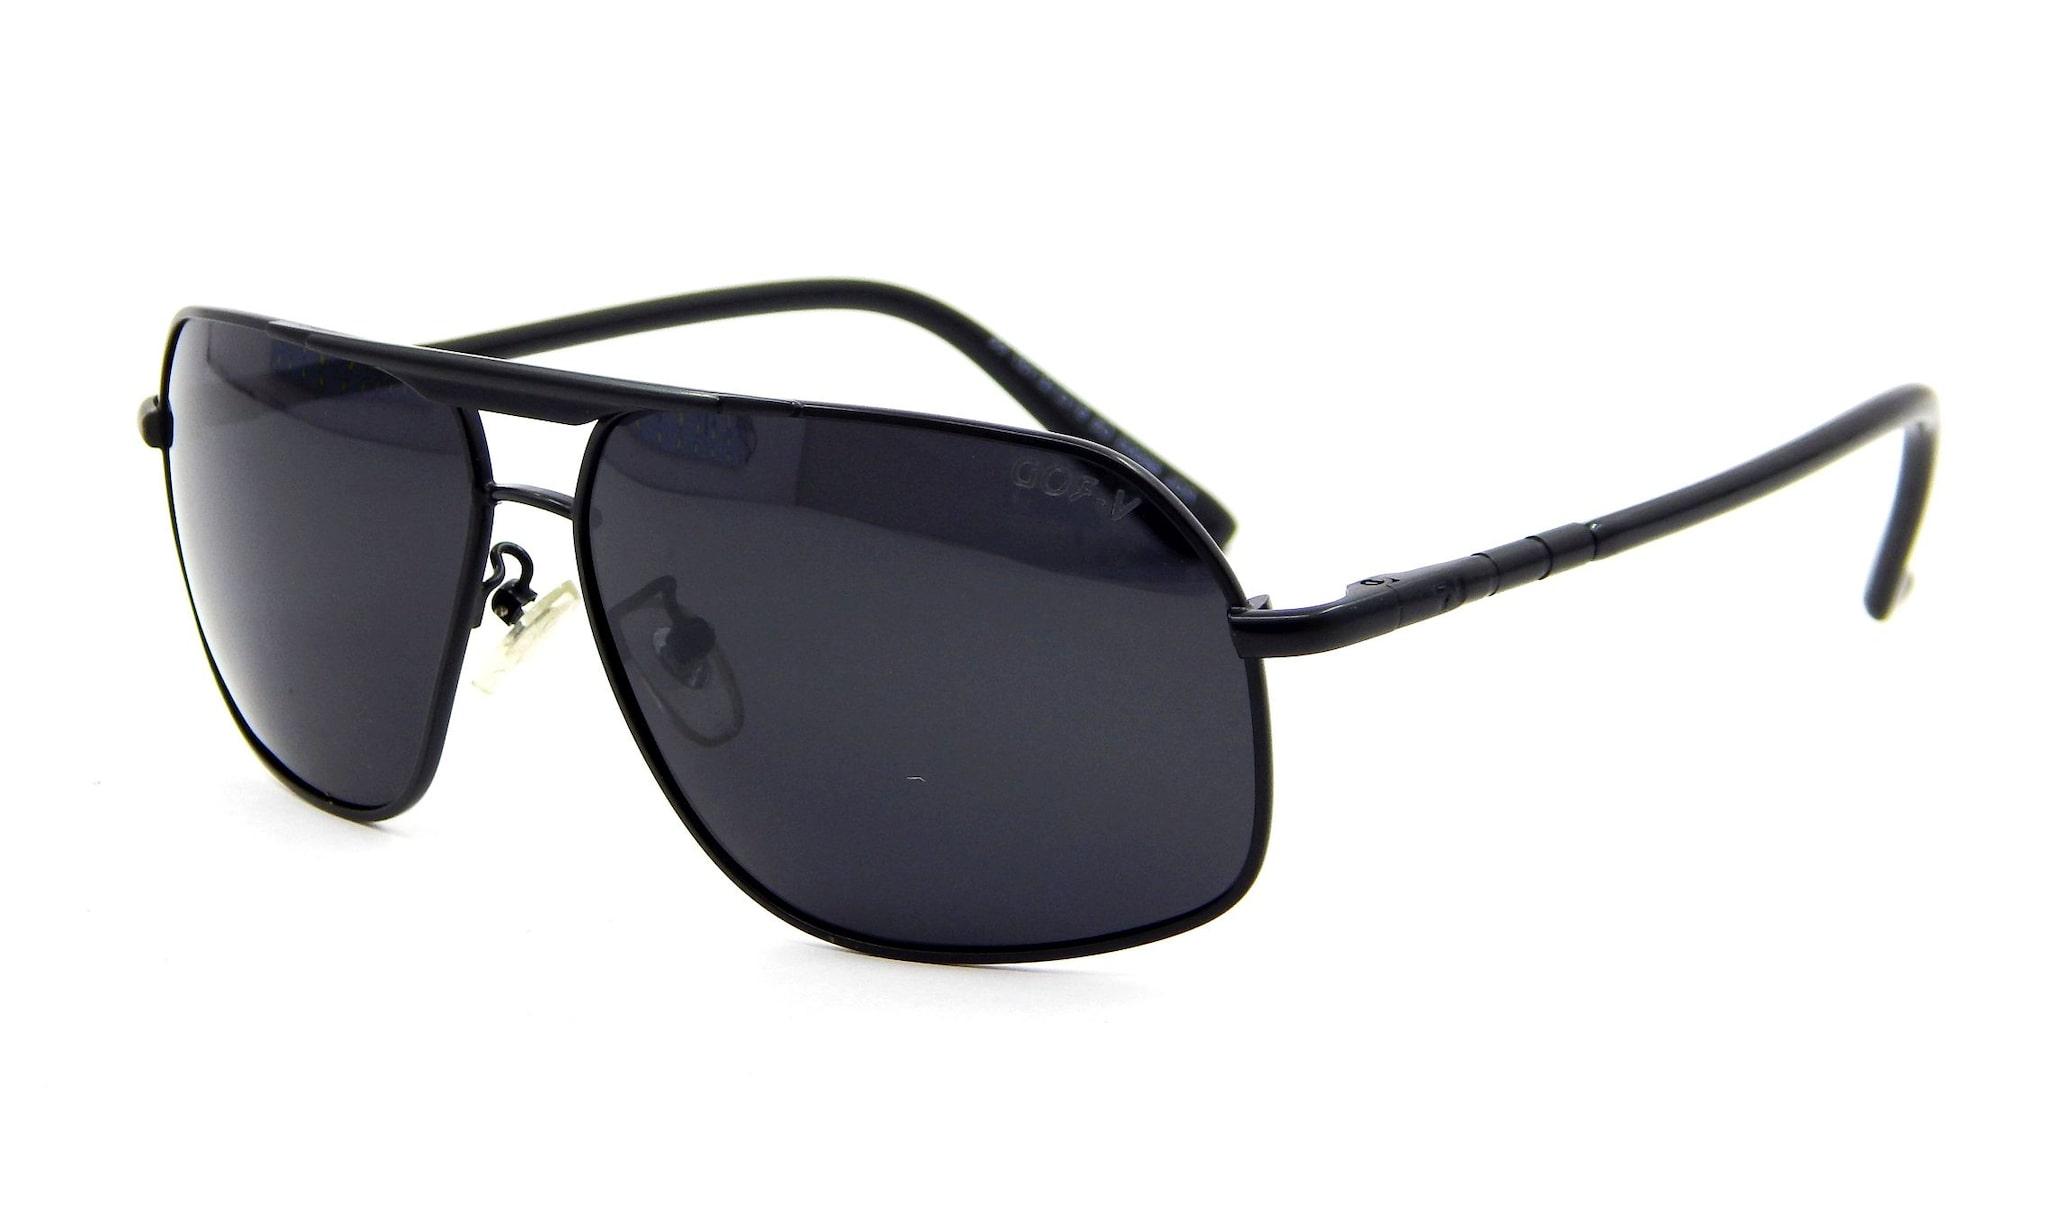 Buy Els Black Rectangular Frames Medium Sunglasses Online At Low